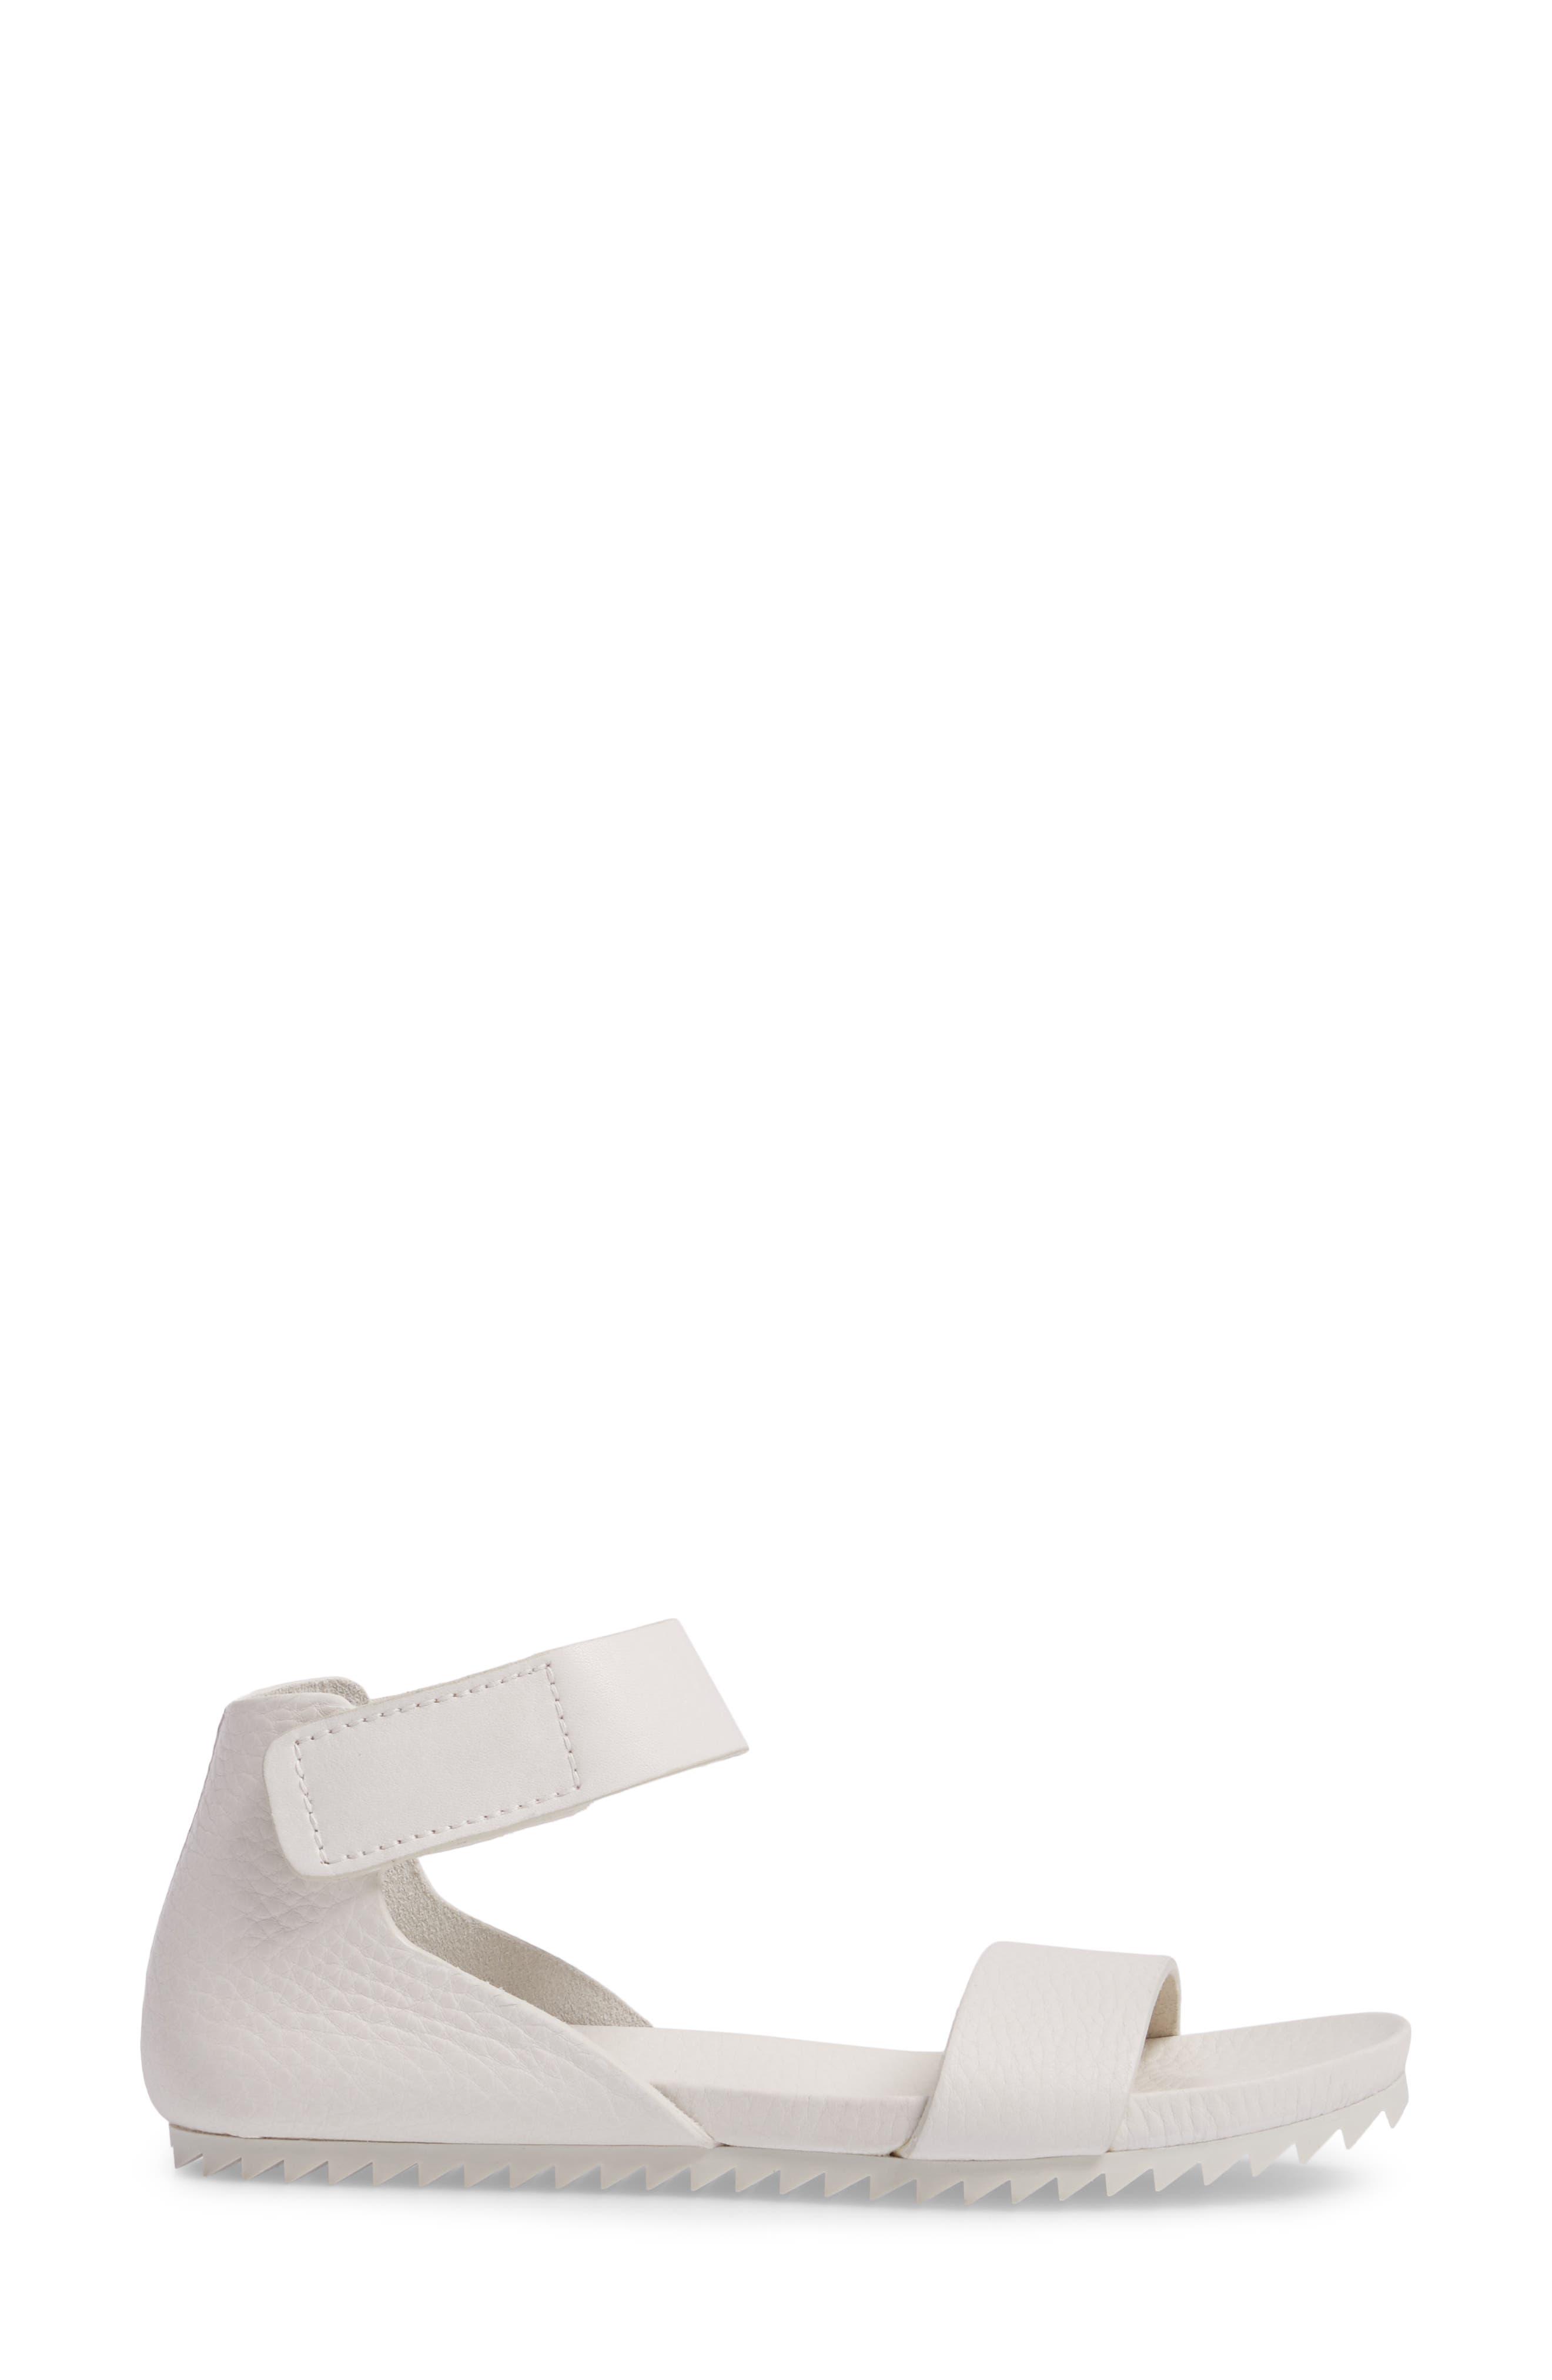 Jalila Ankle Strap Sandal,                             Alternate thumbnail 3, color,                             Chalk Cervo